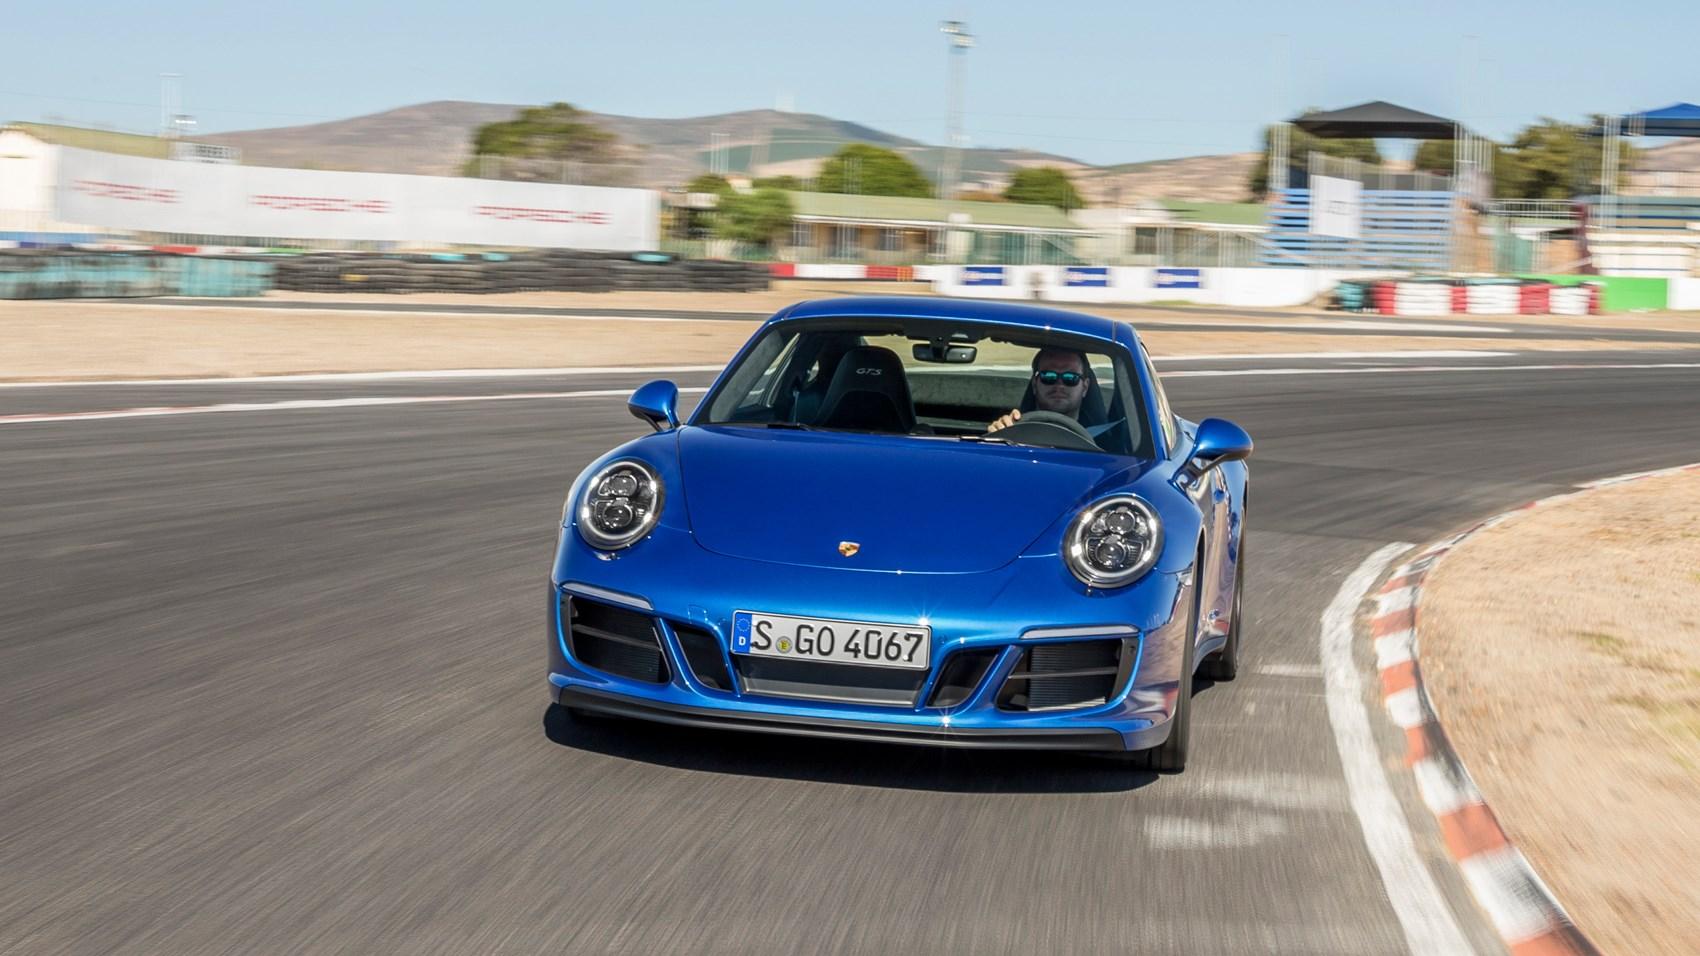 Porsche Panamera Lease >> Porsche 911 Carrera 4 GTS (2018) review: all the trimmings ...